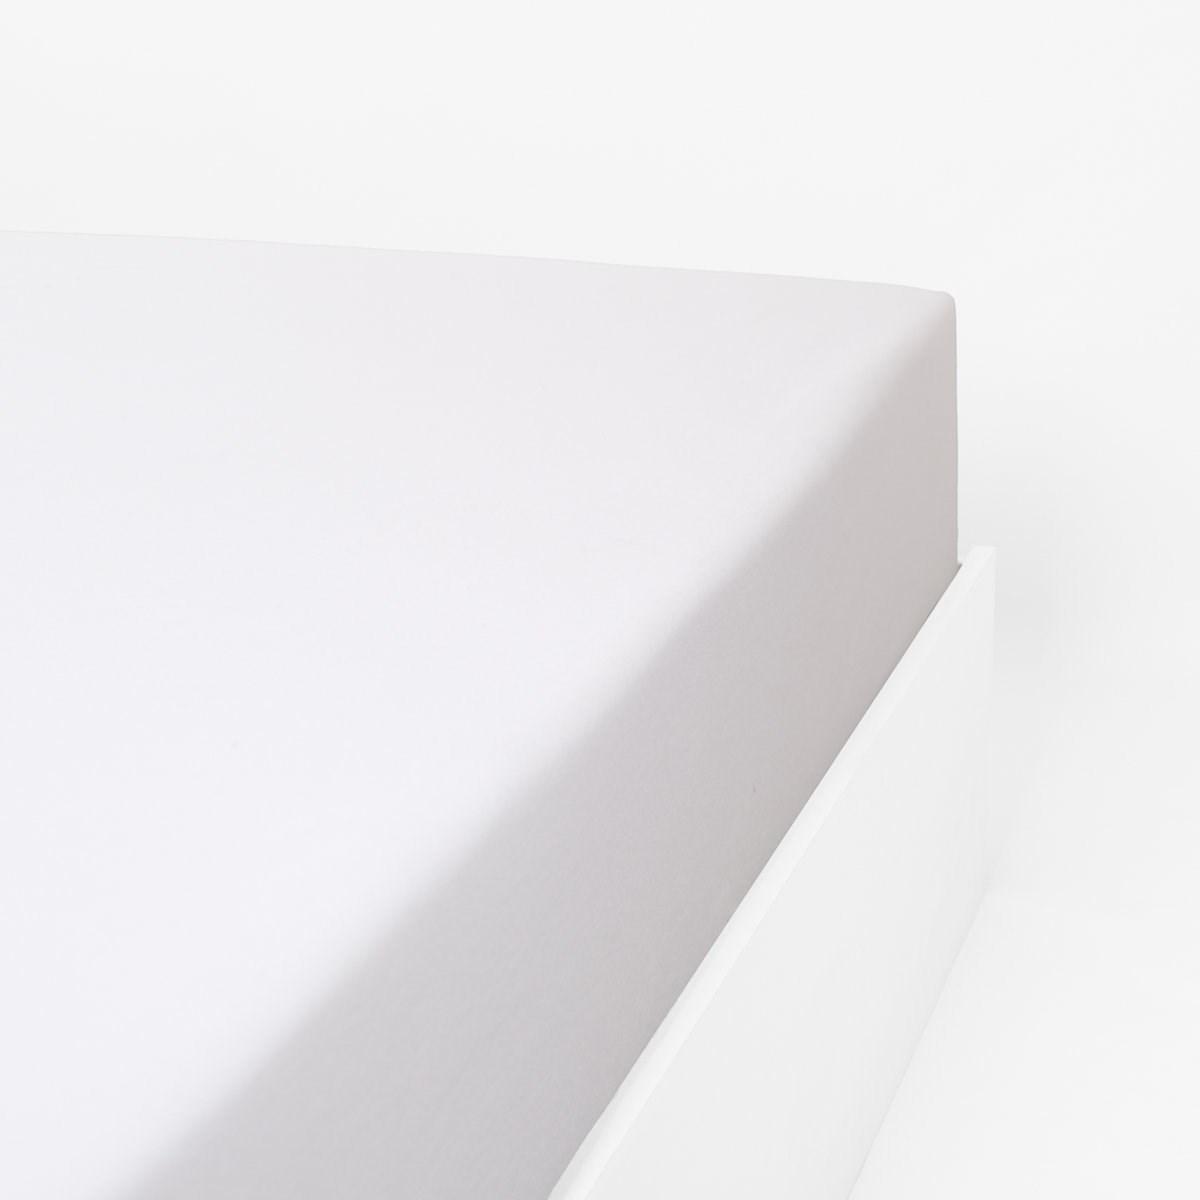 Drap housse flanelle en Molleton Blanc 110x190 cm